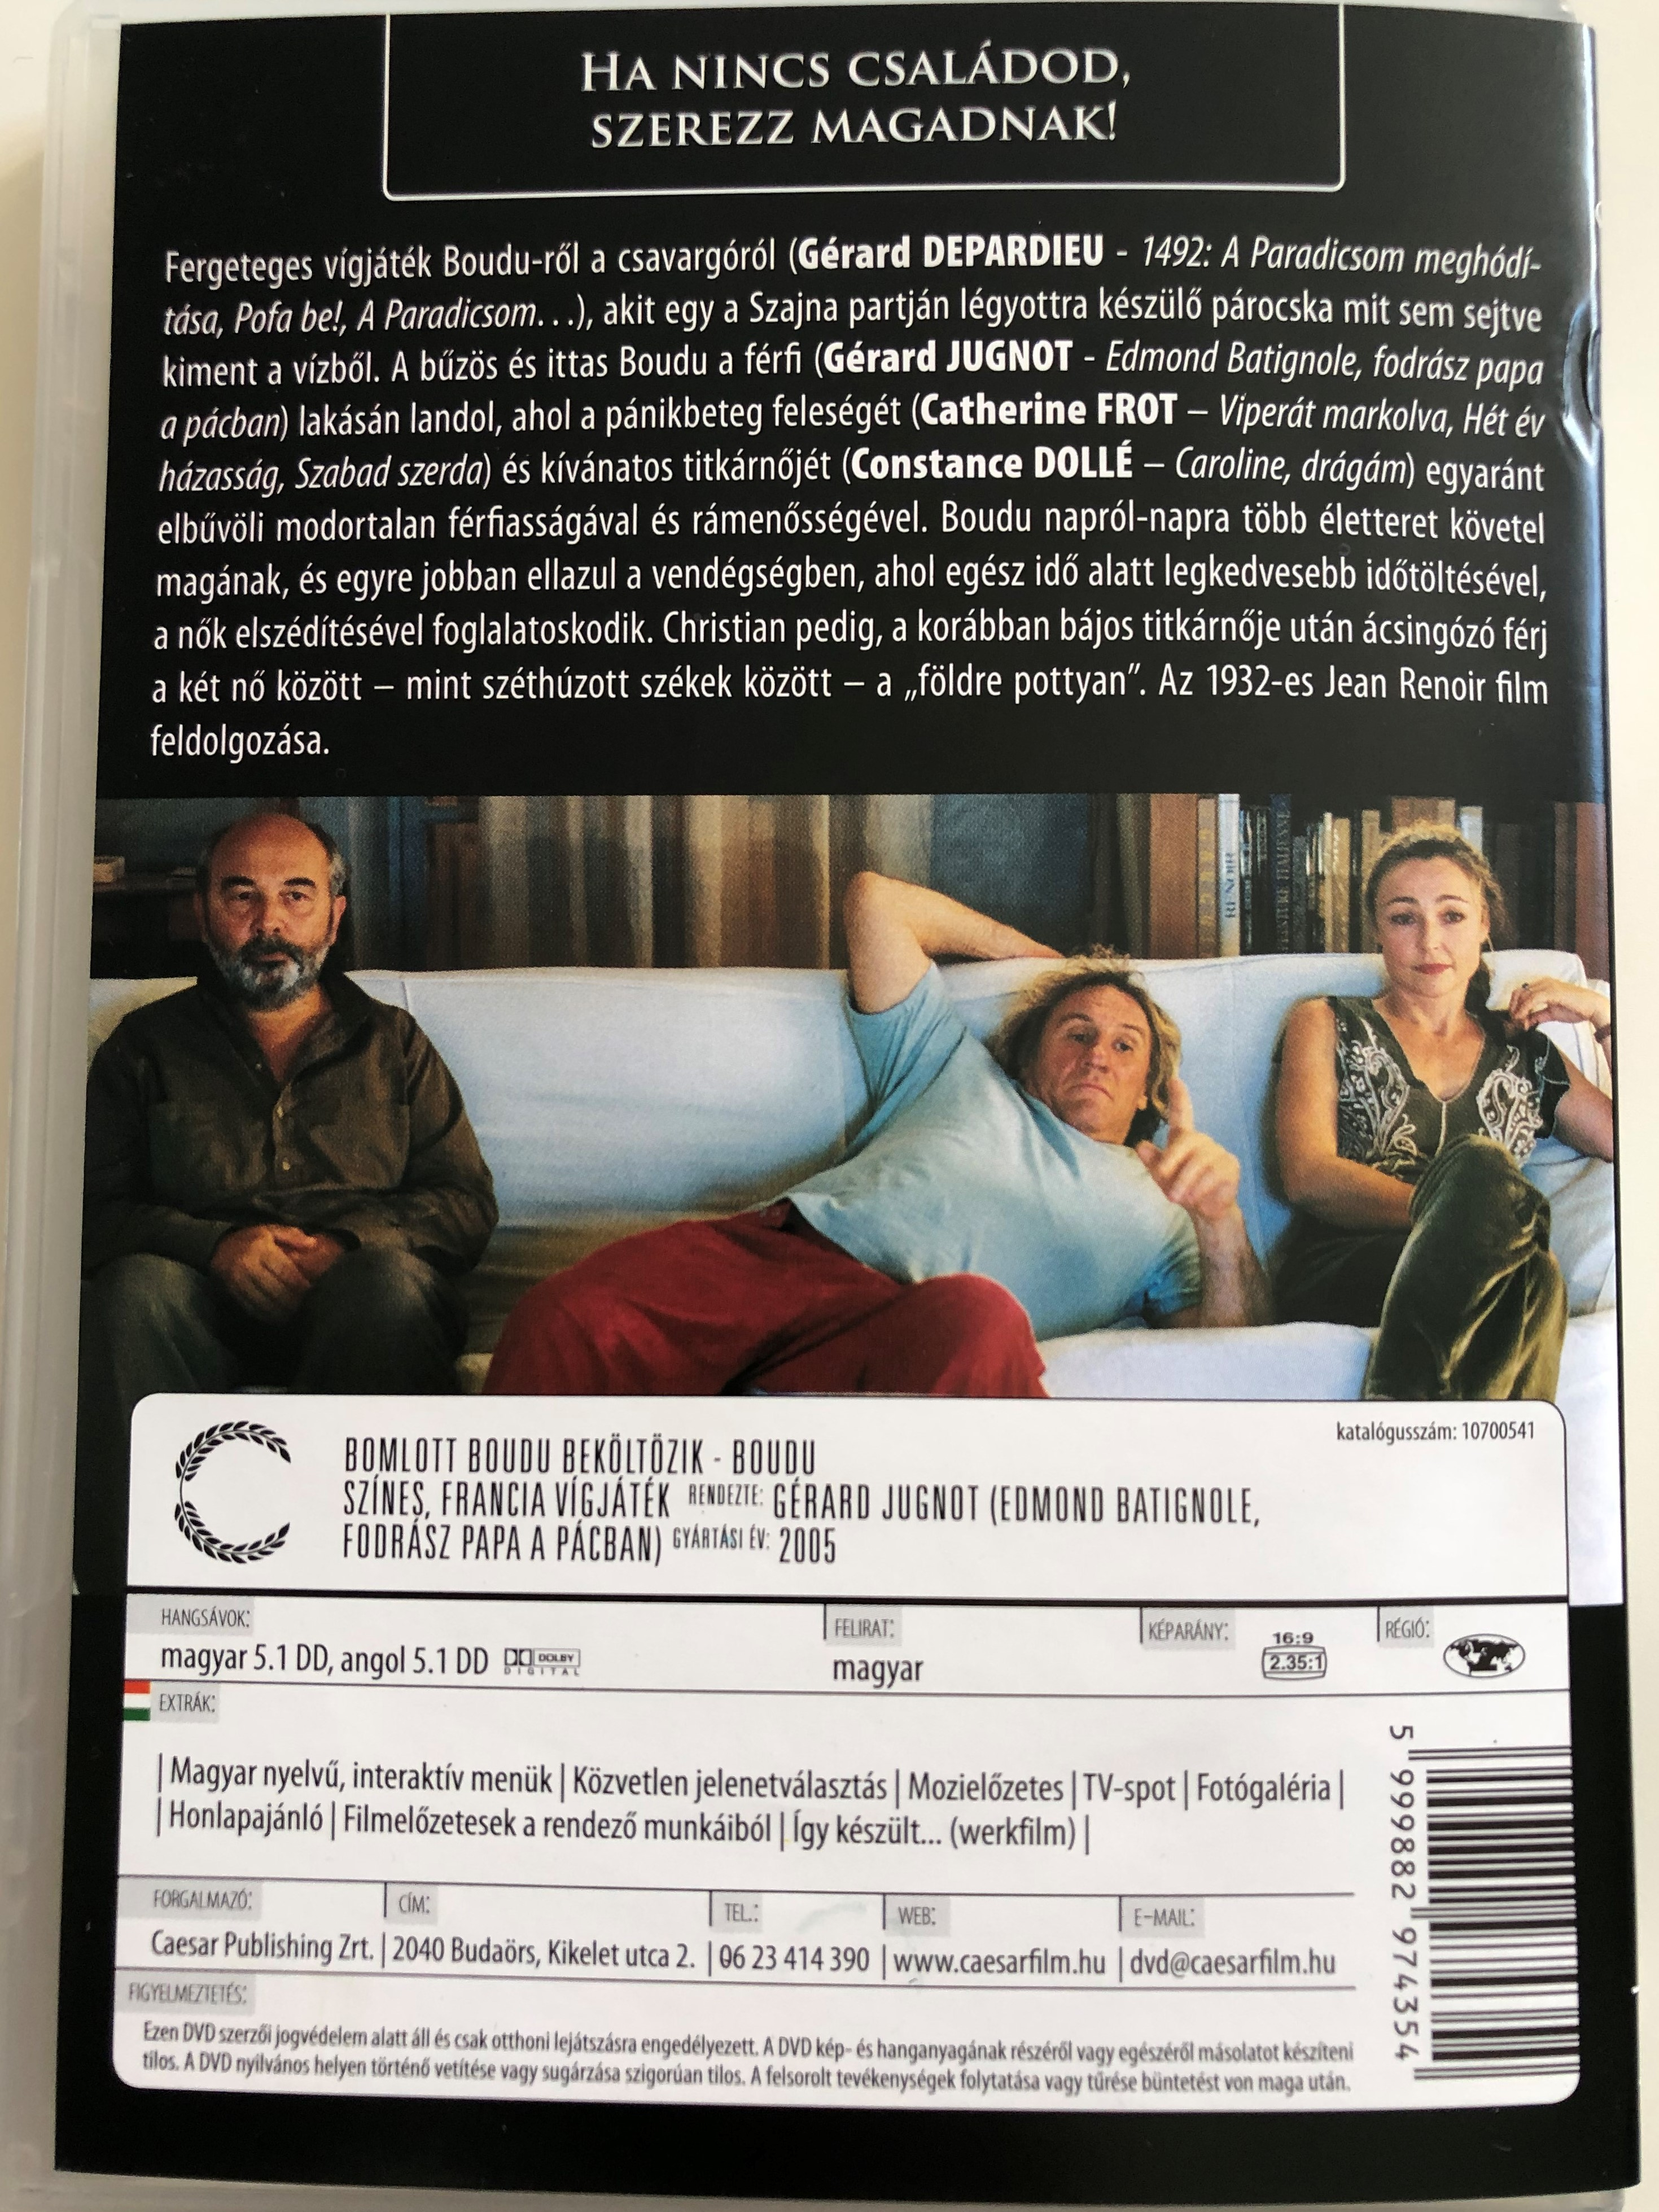 boudu-dvd-2005-bomlott-boudu-bek-lt-zik-directed-by-g-rard-jugnot-2.jpg